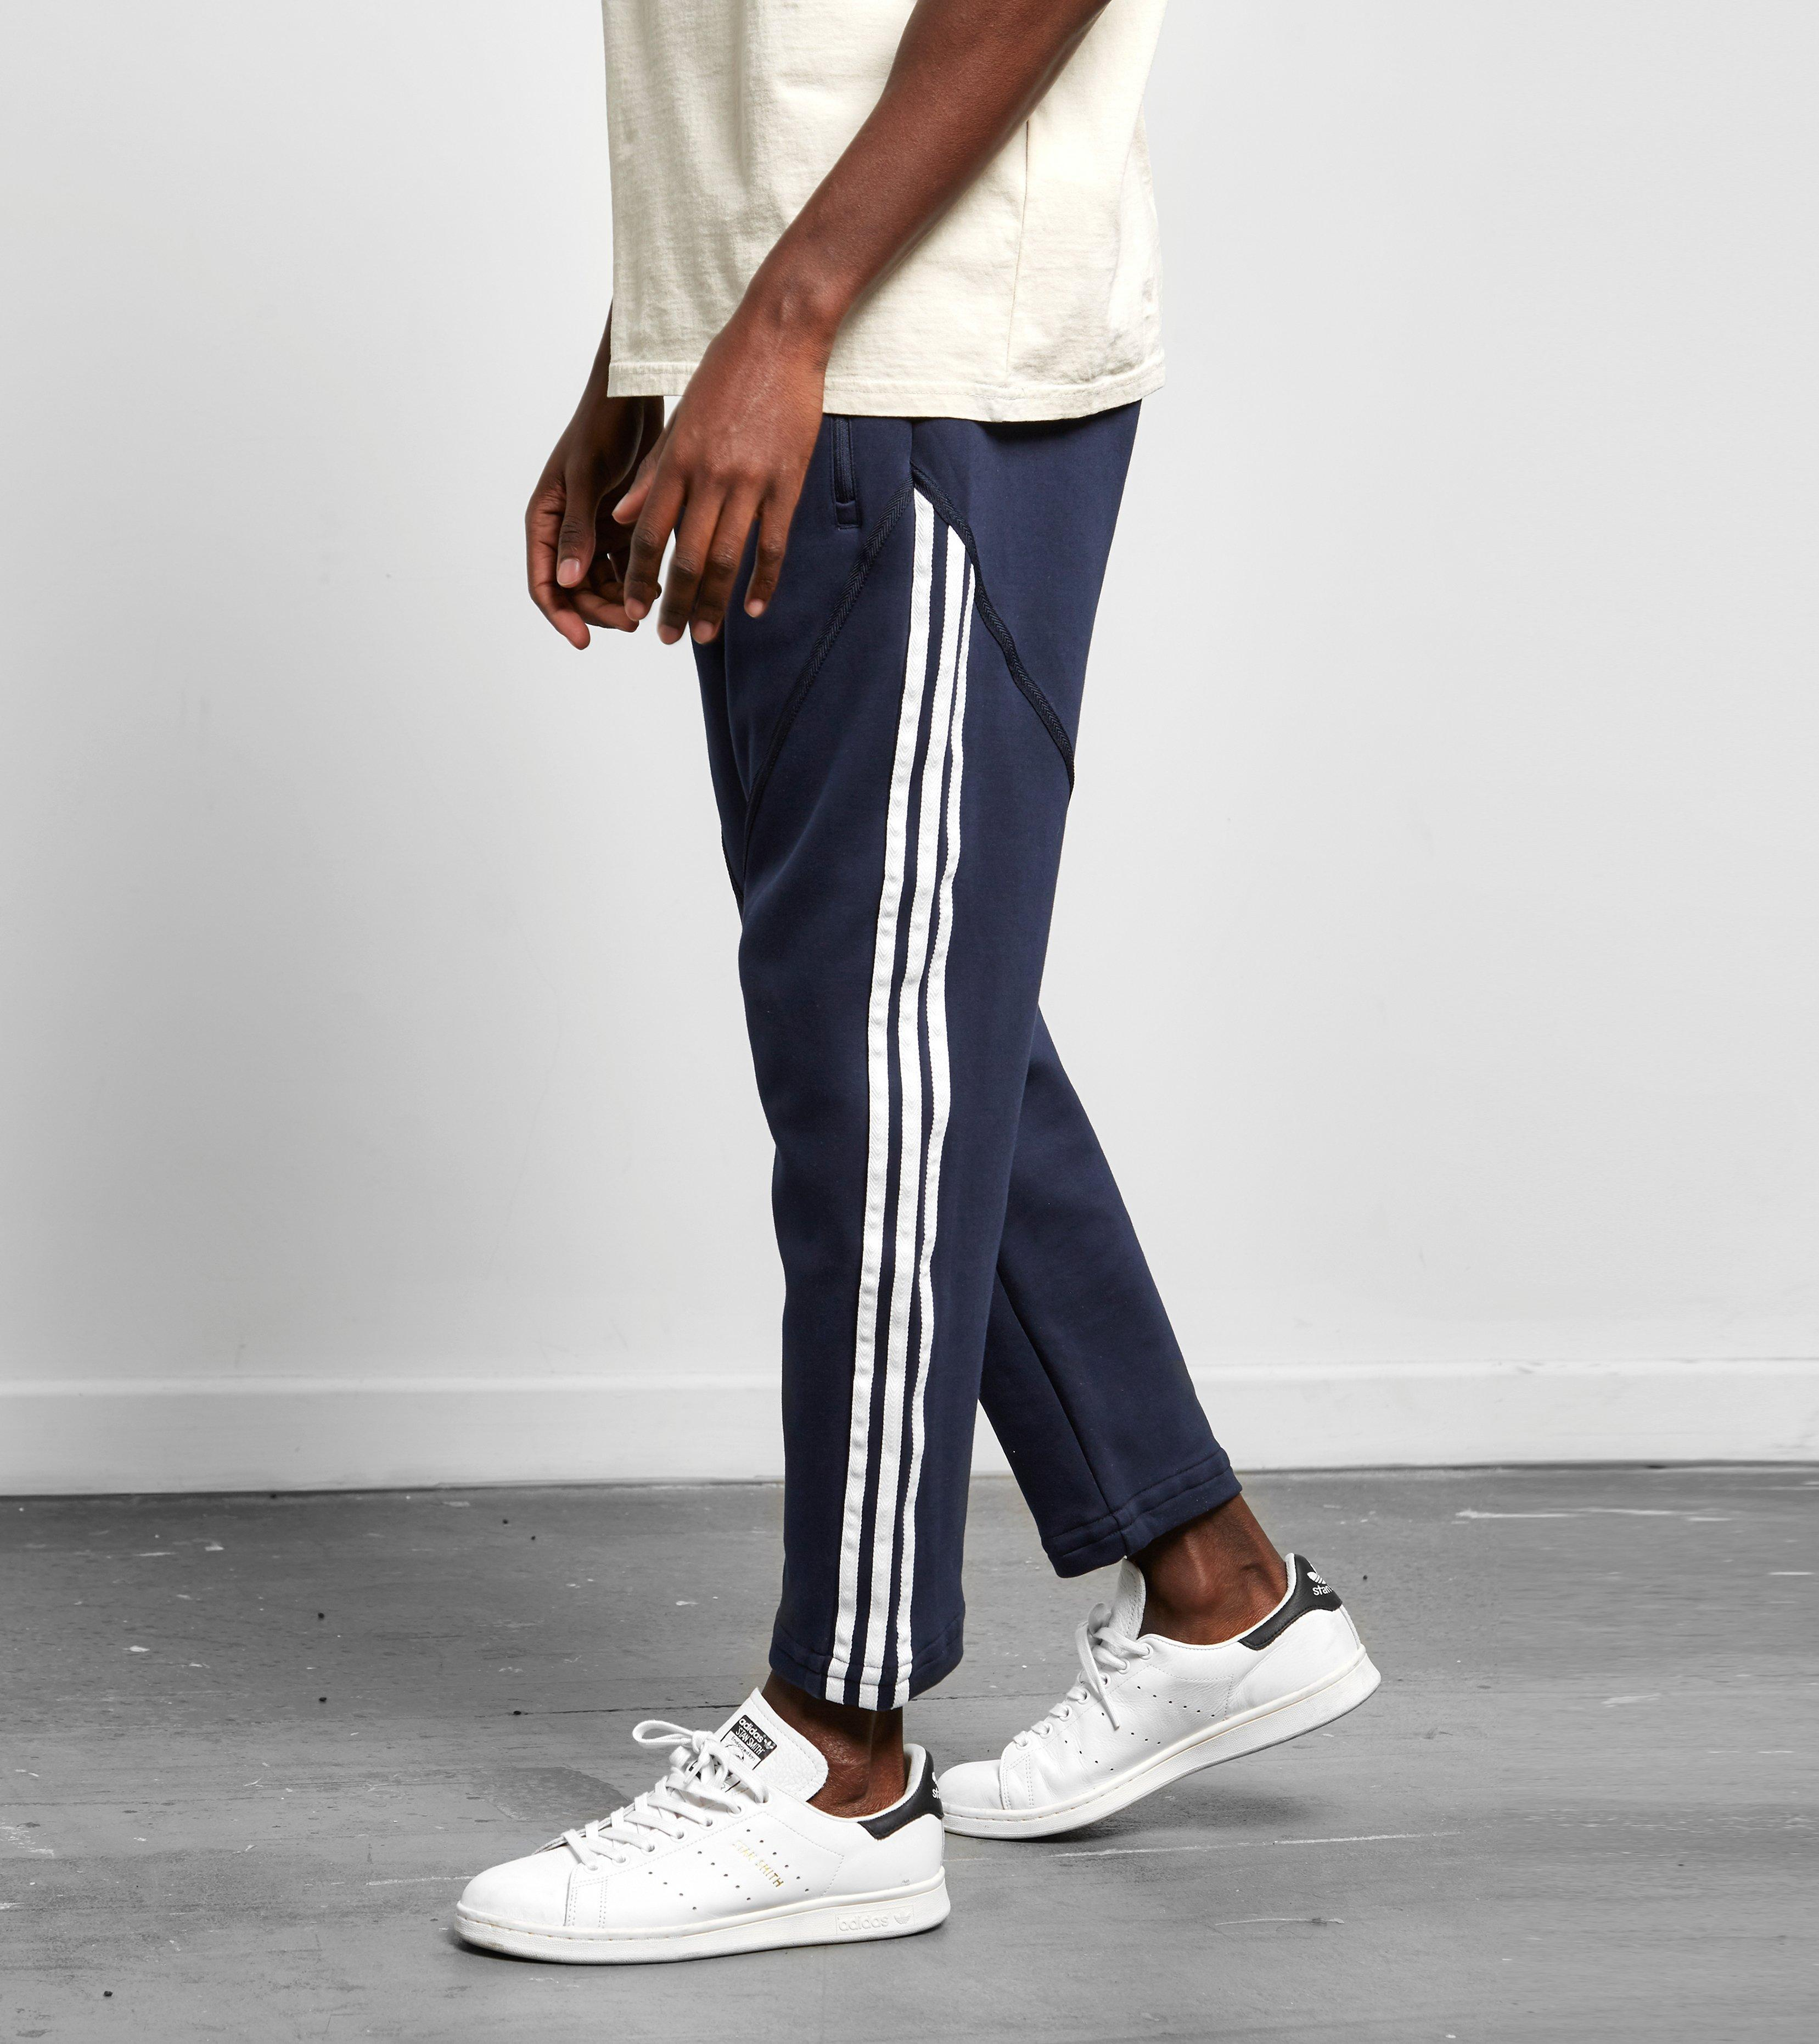 Adidas originali nmd pantaloncini blu per gli uomini lyst